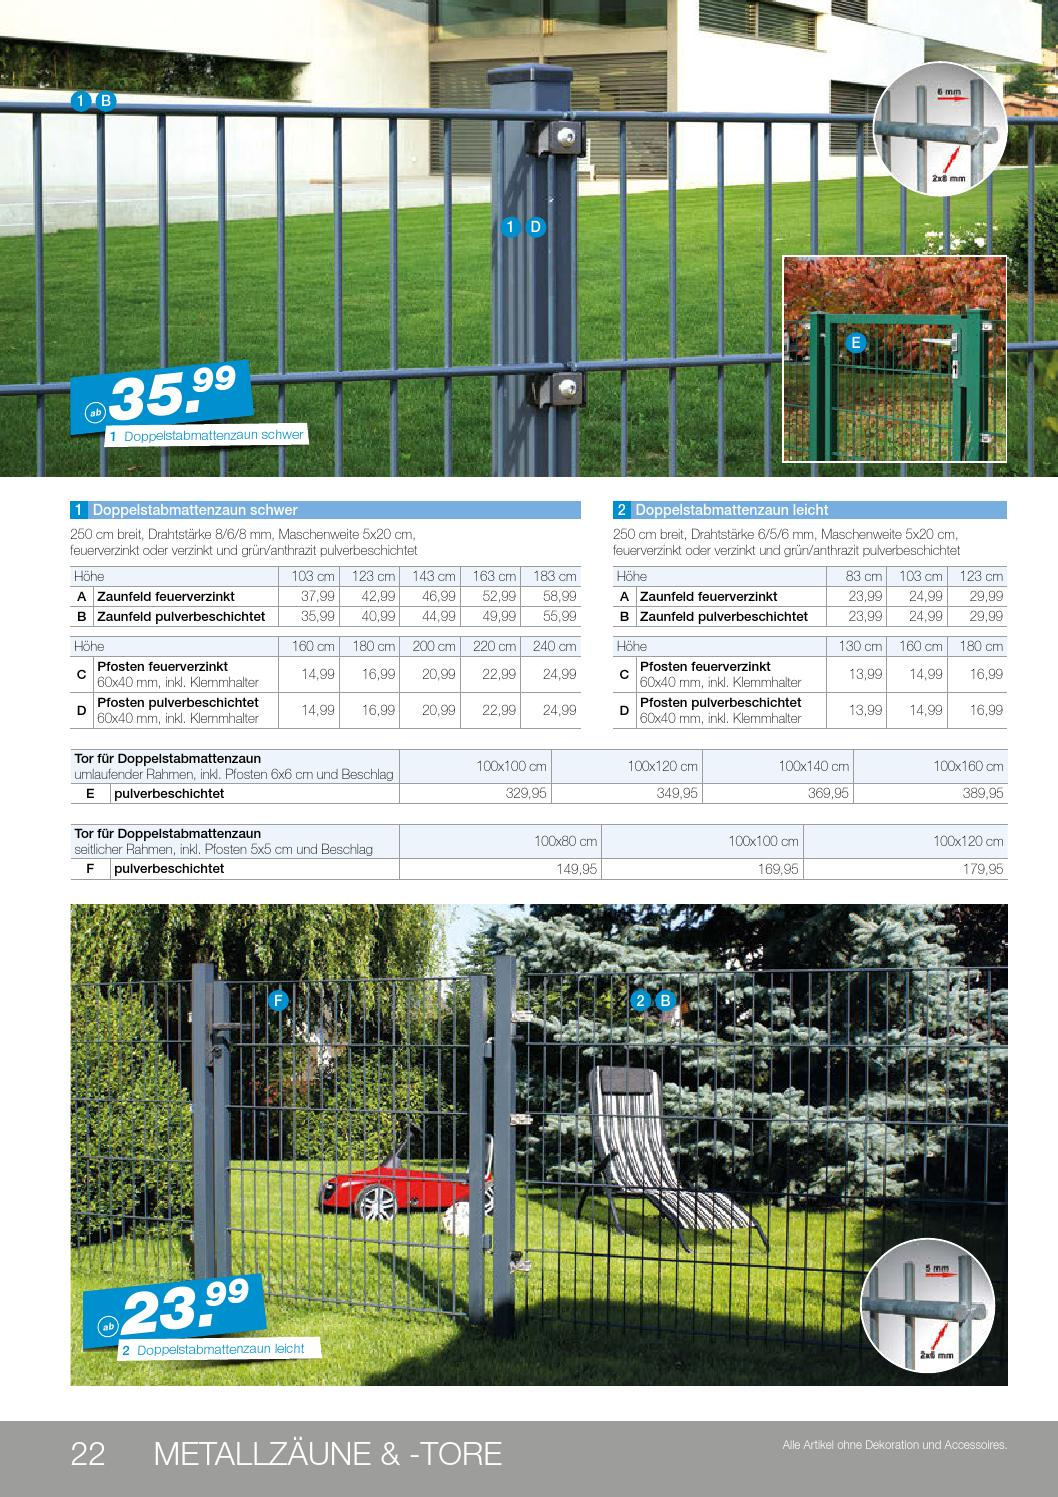 Plambeck Gartenkatalog 2016 by FULLHAUS - issuu